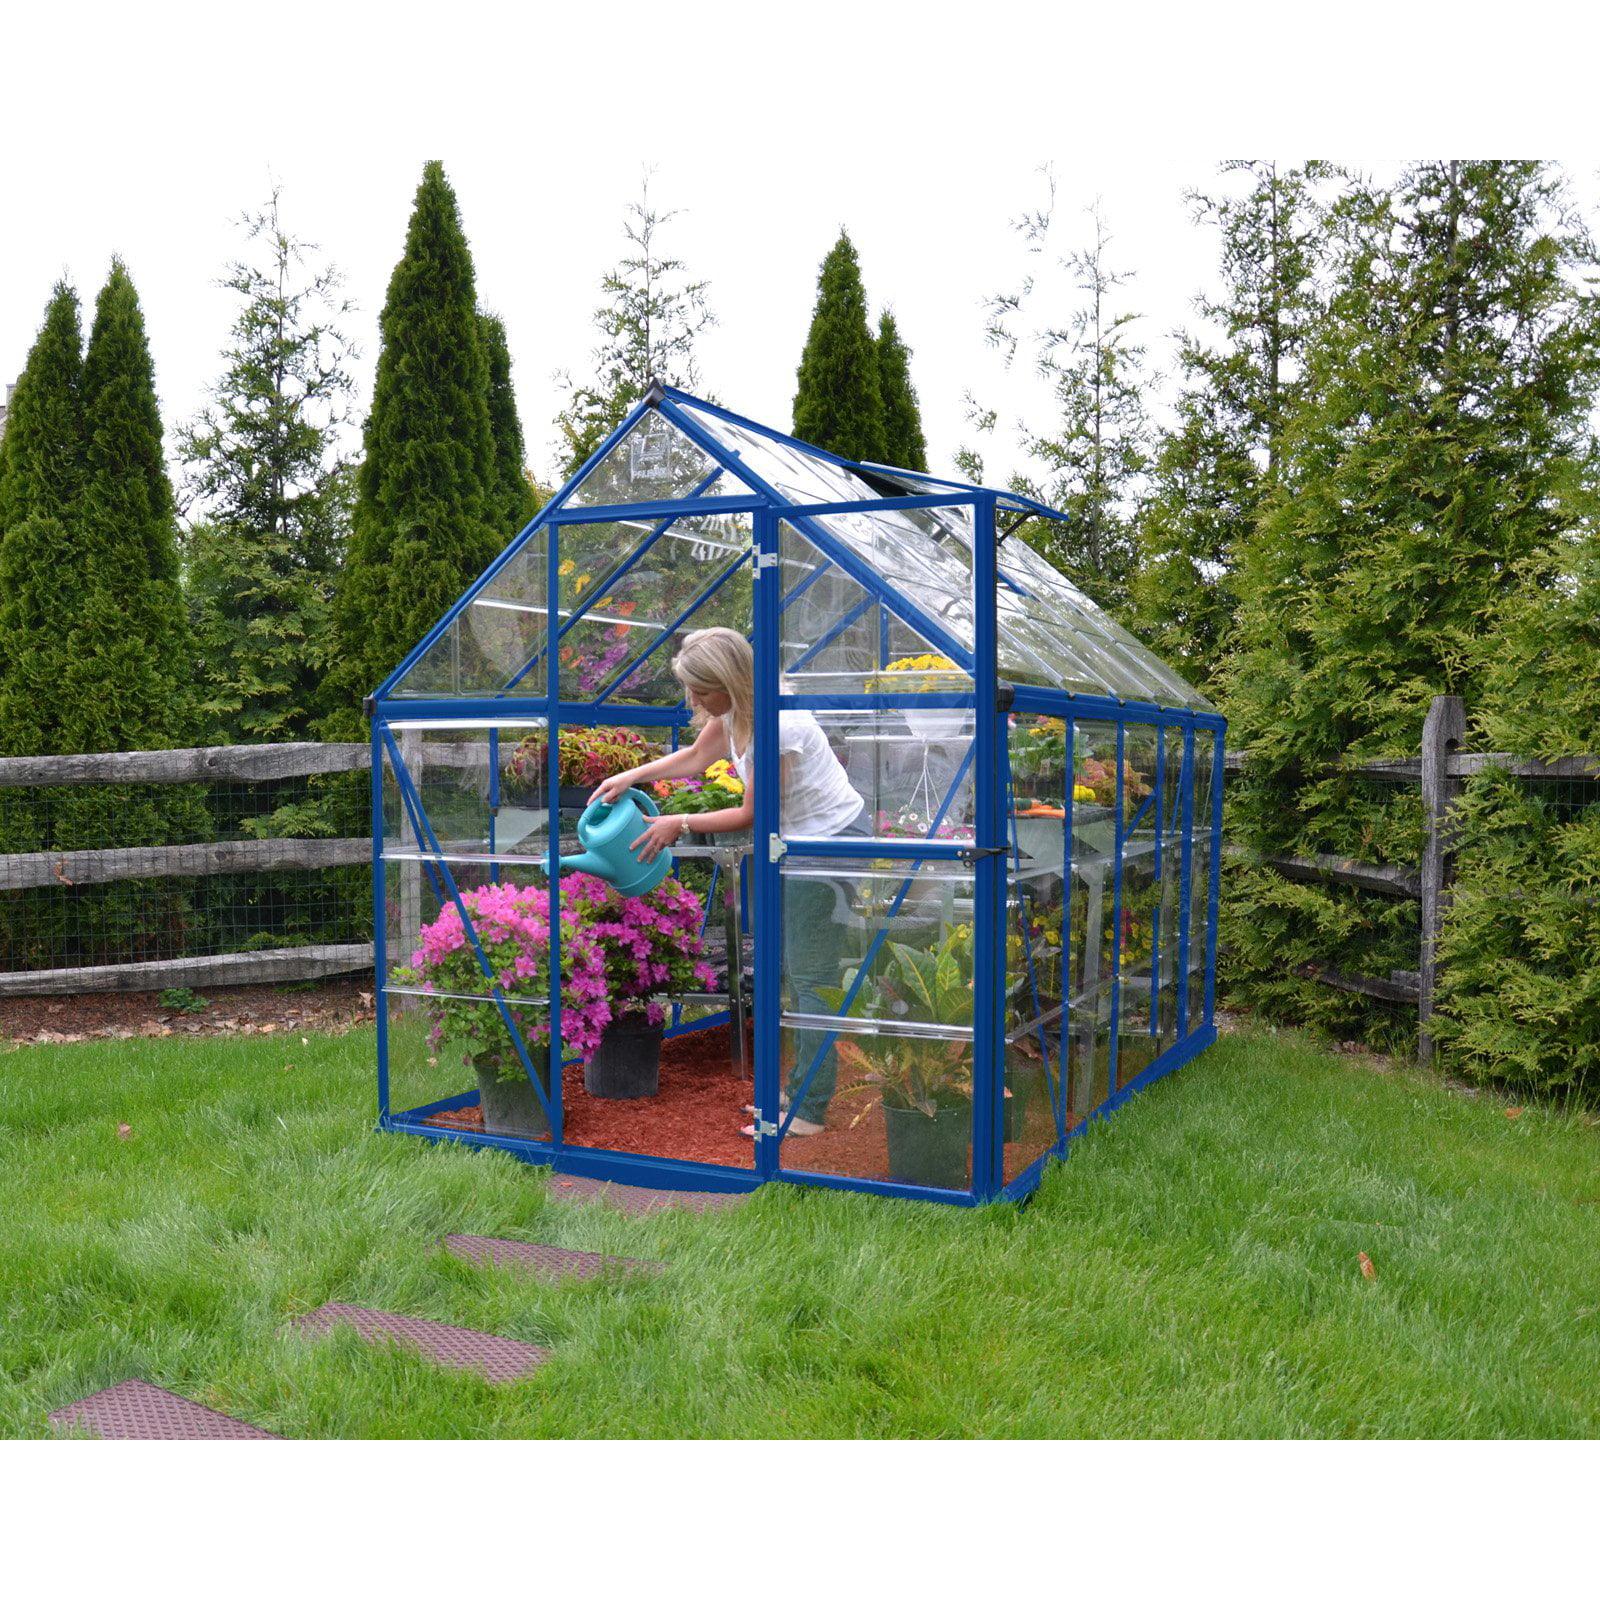 Blue Harmony Greenhouse, 6' x 10' by Palram